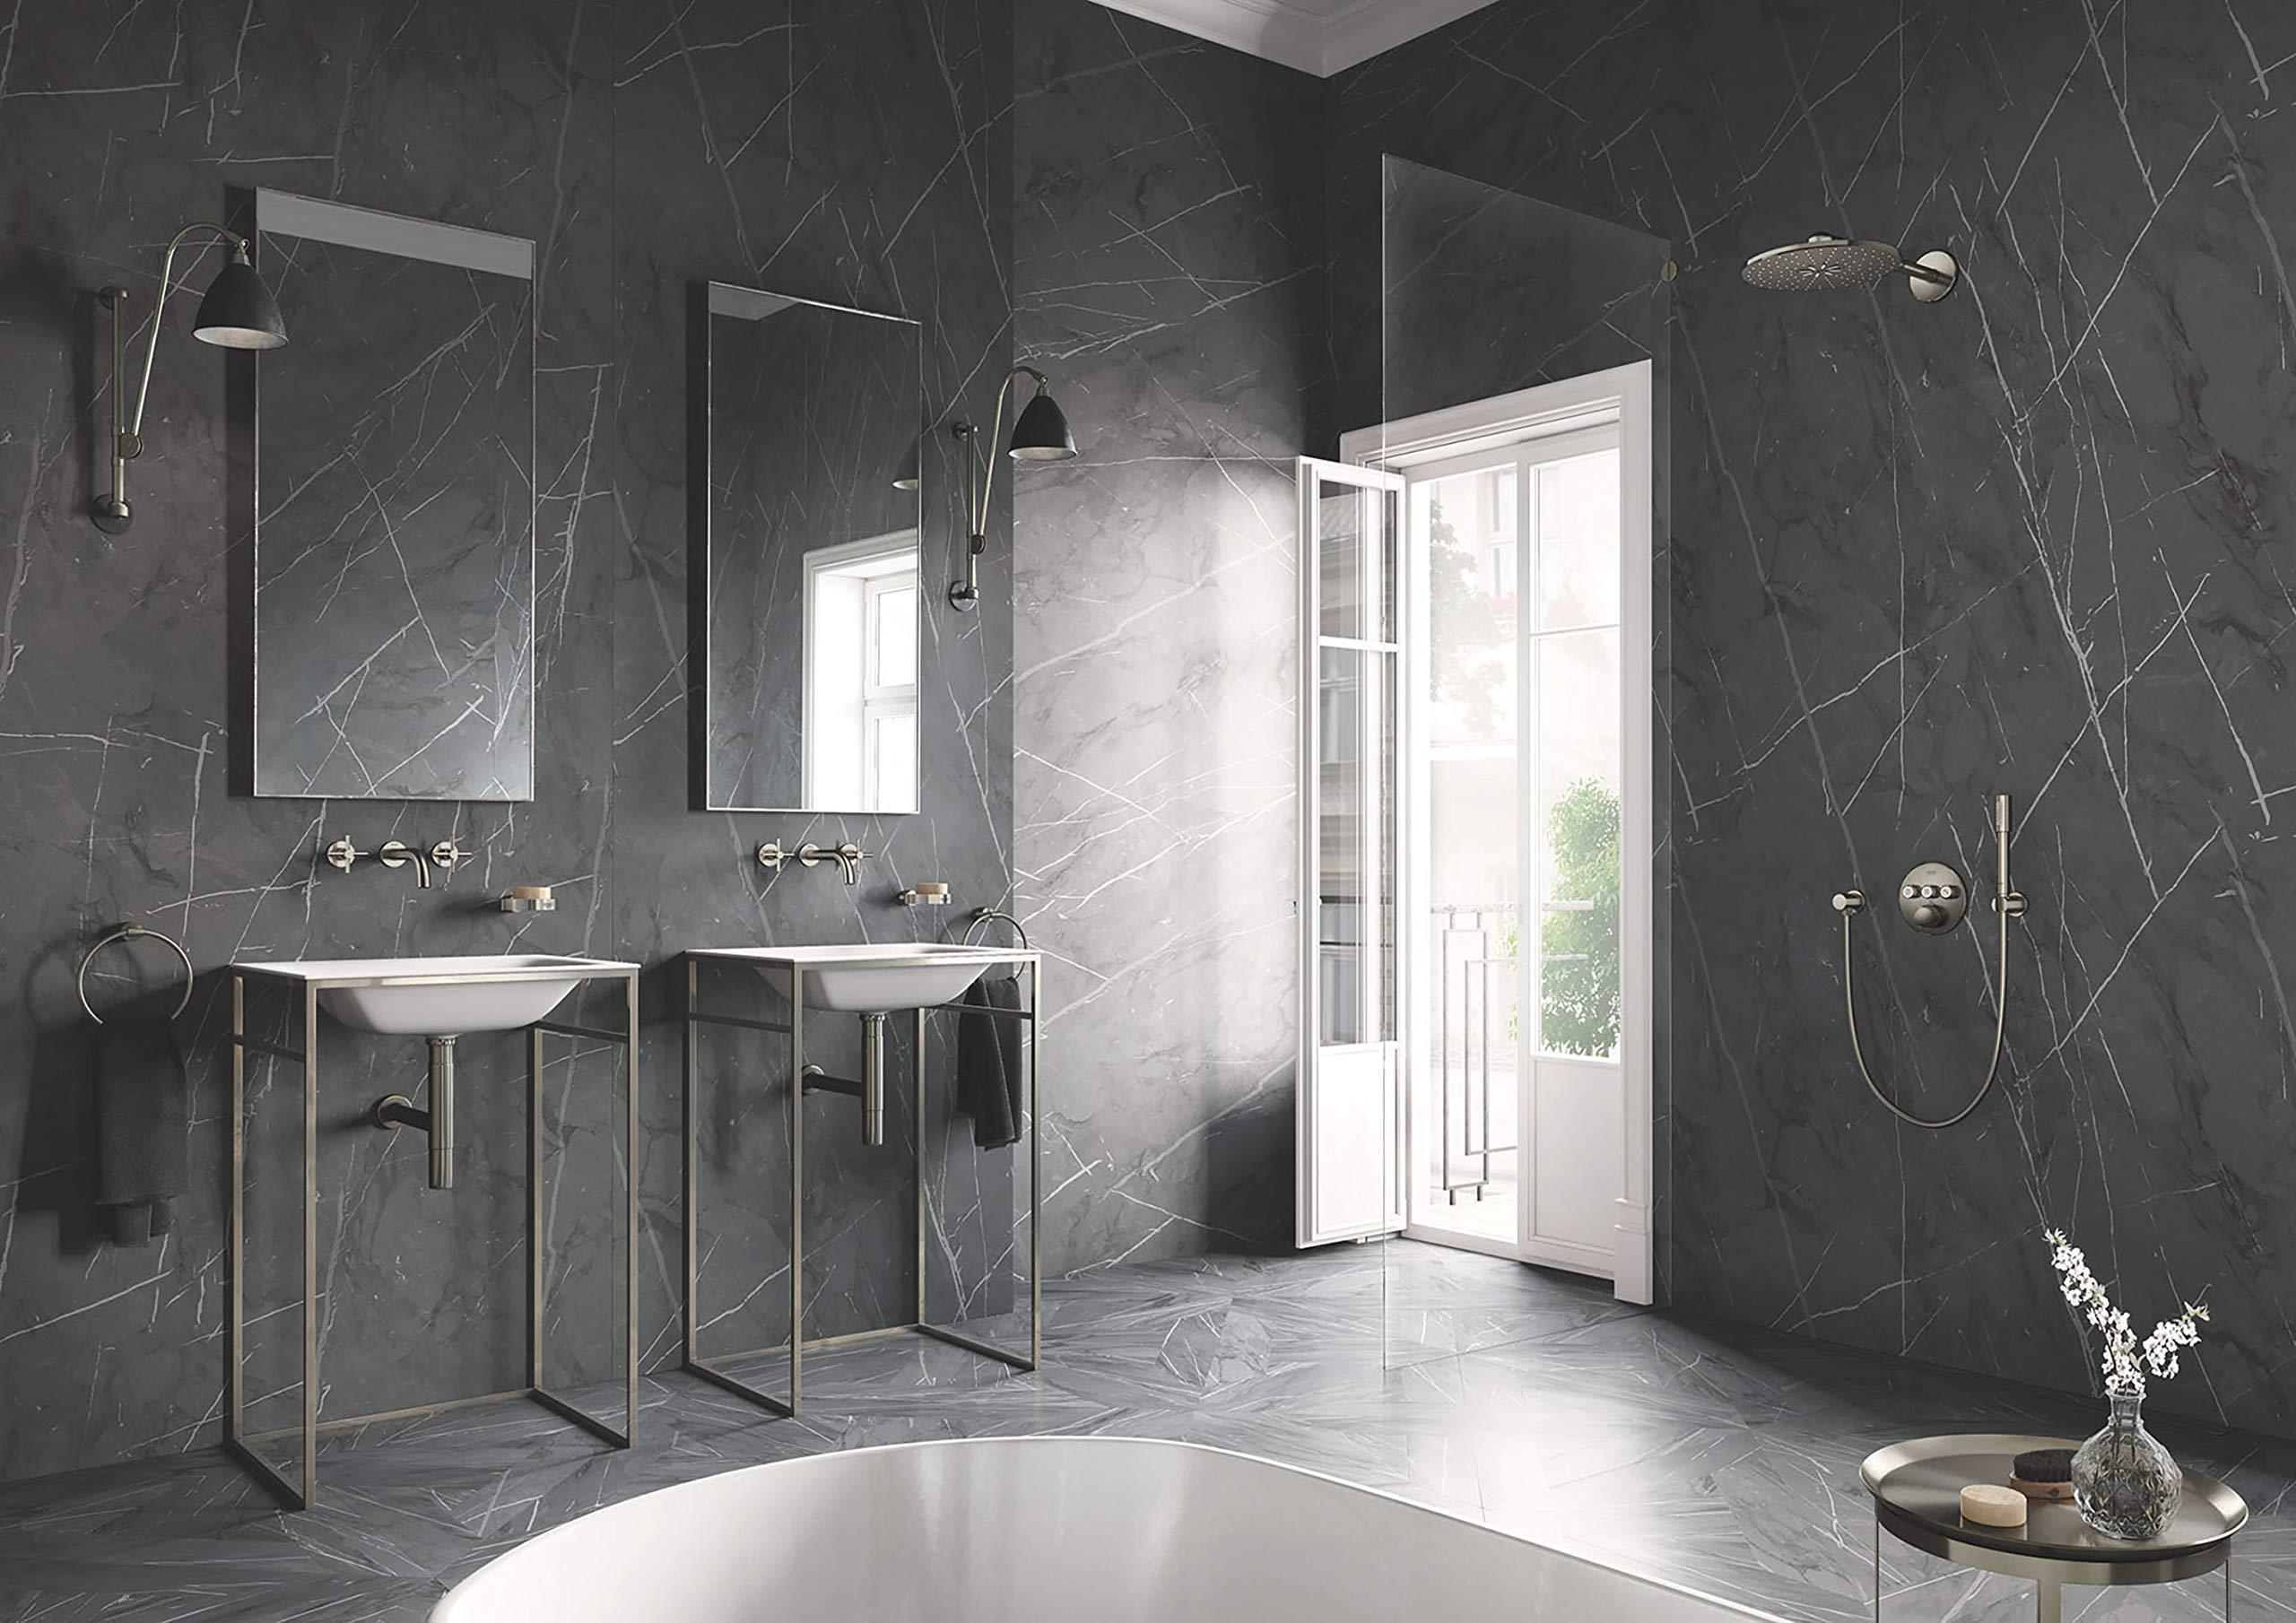 Grohe 18026EN3 Atrio Bathroom Faucet Cross Handles, Brushed Nickel by GROHE (Image #6)